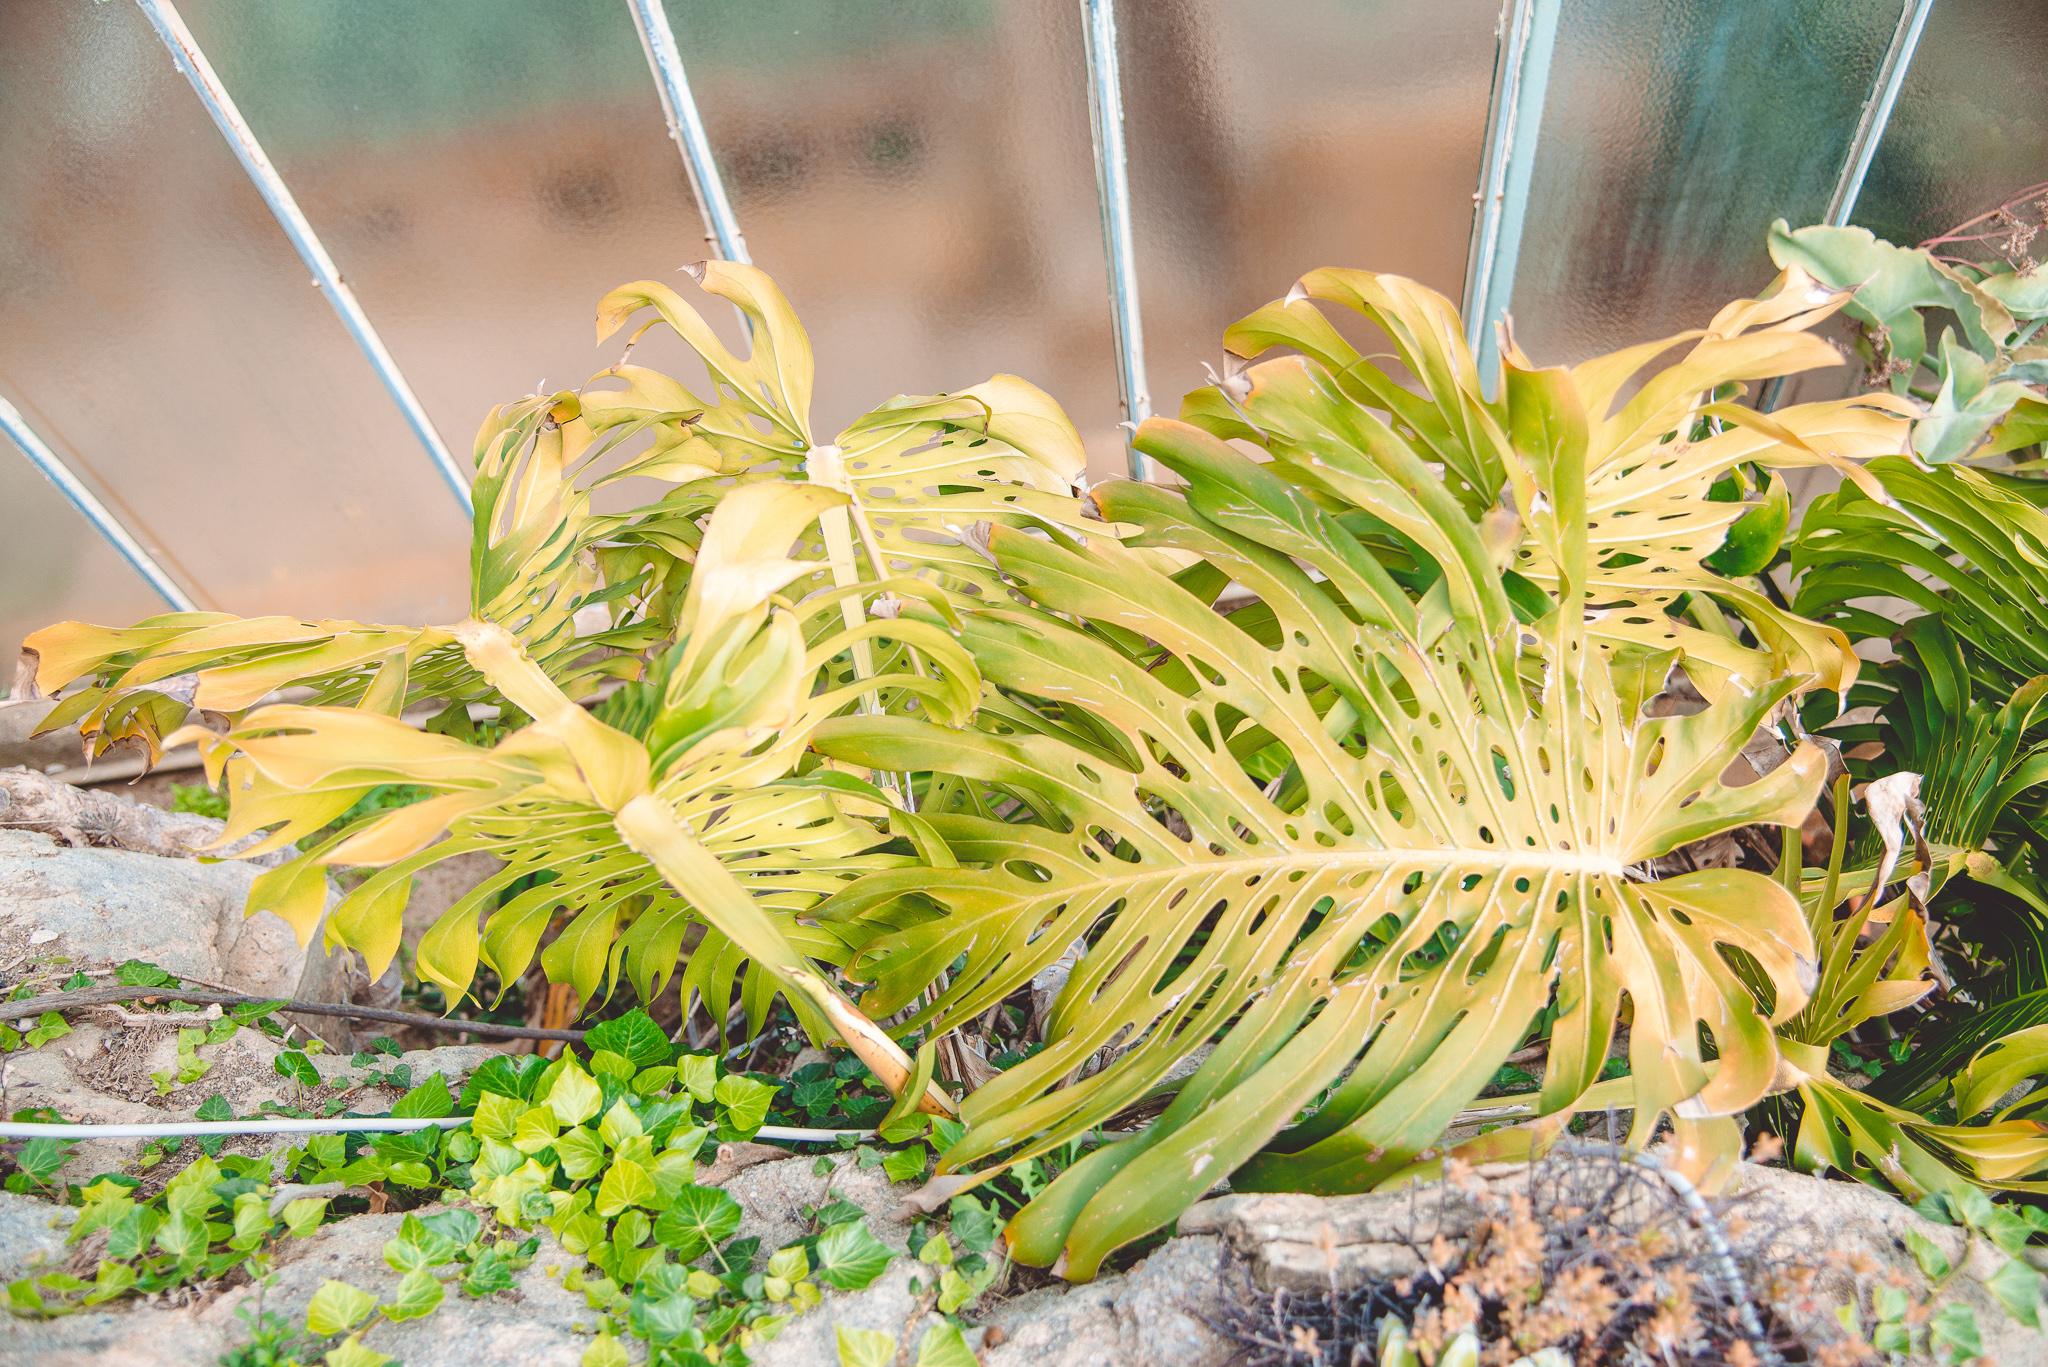 orto-botanico-pallanca-bordighera-2serialtravelers